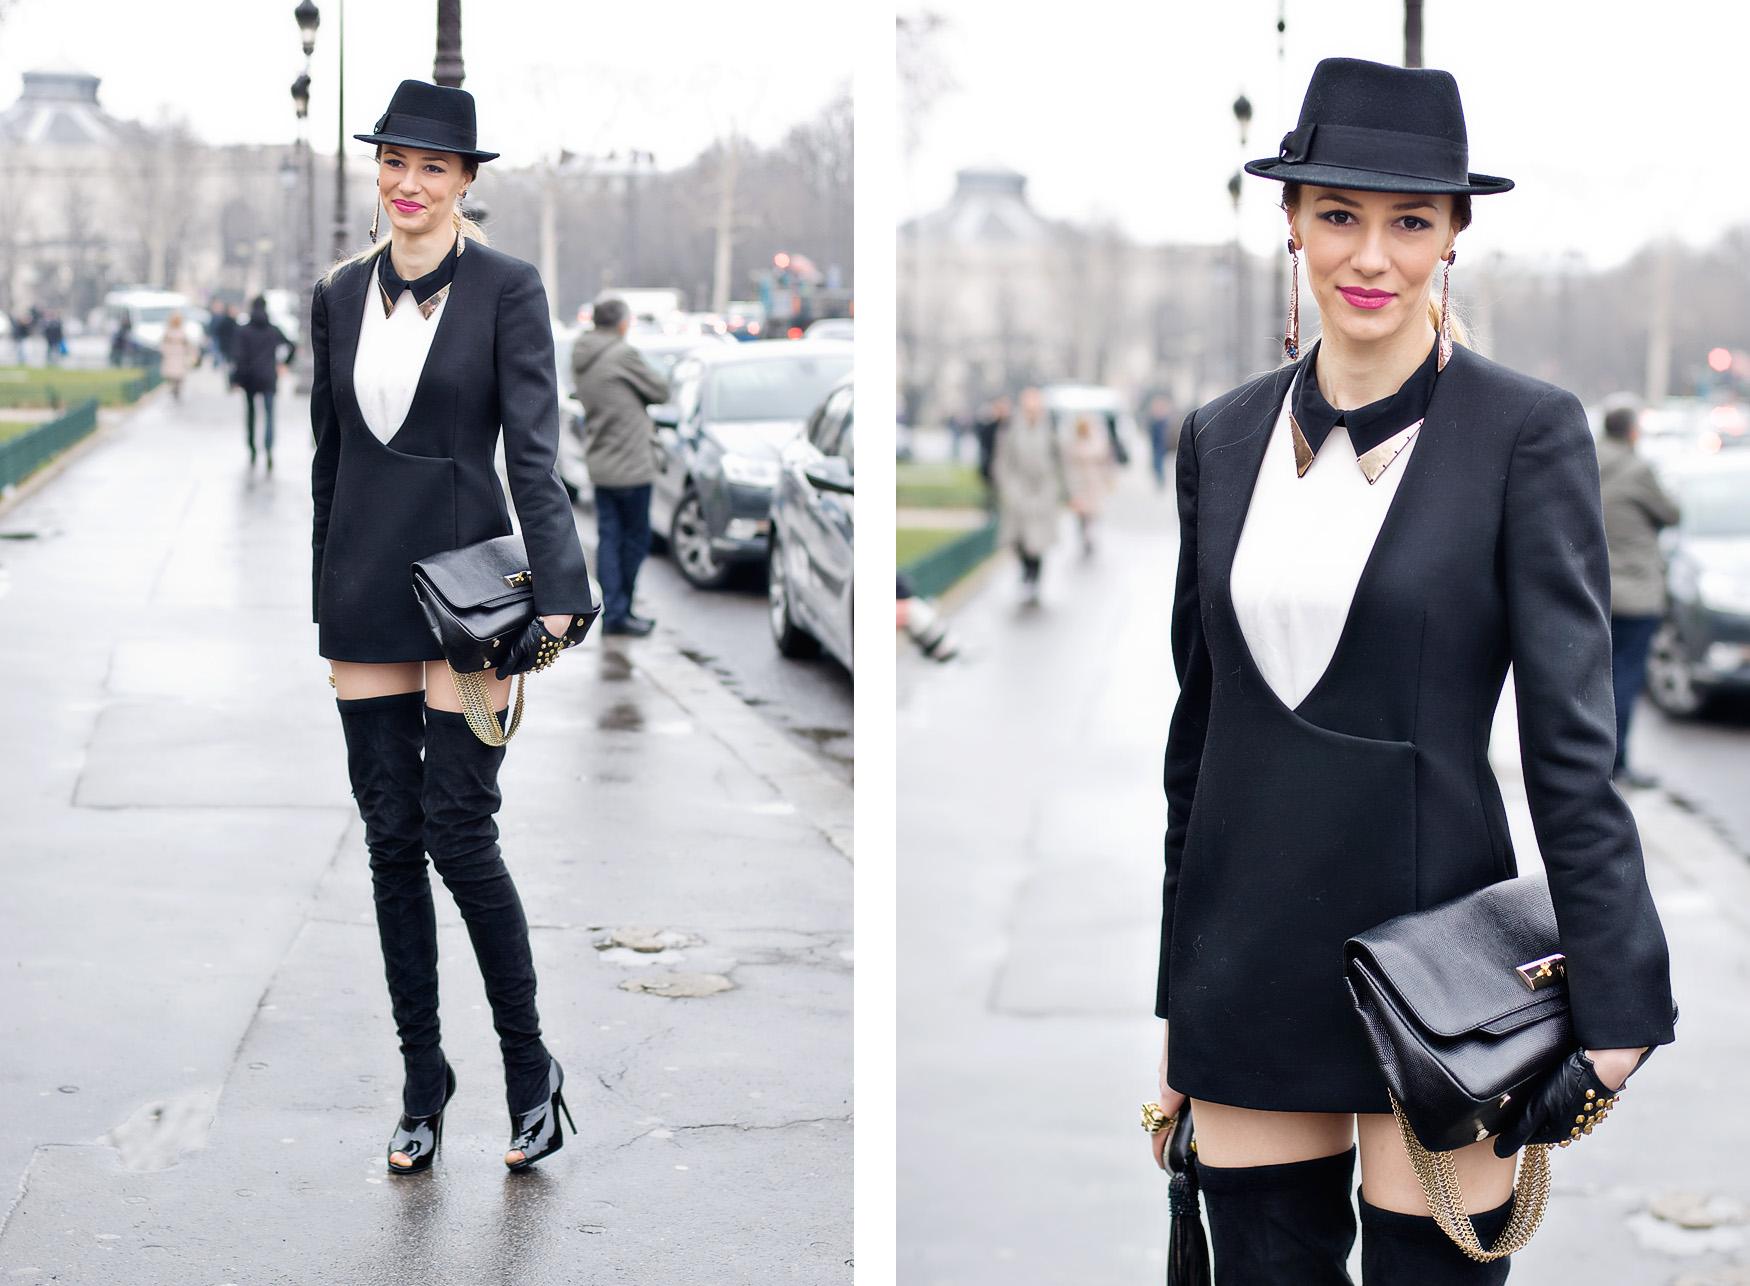 Iphone stylish 6s cases, Thousand supertrash ways dress how to wear